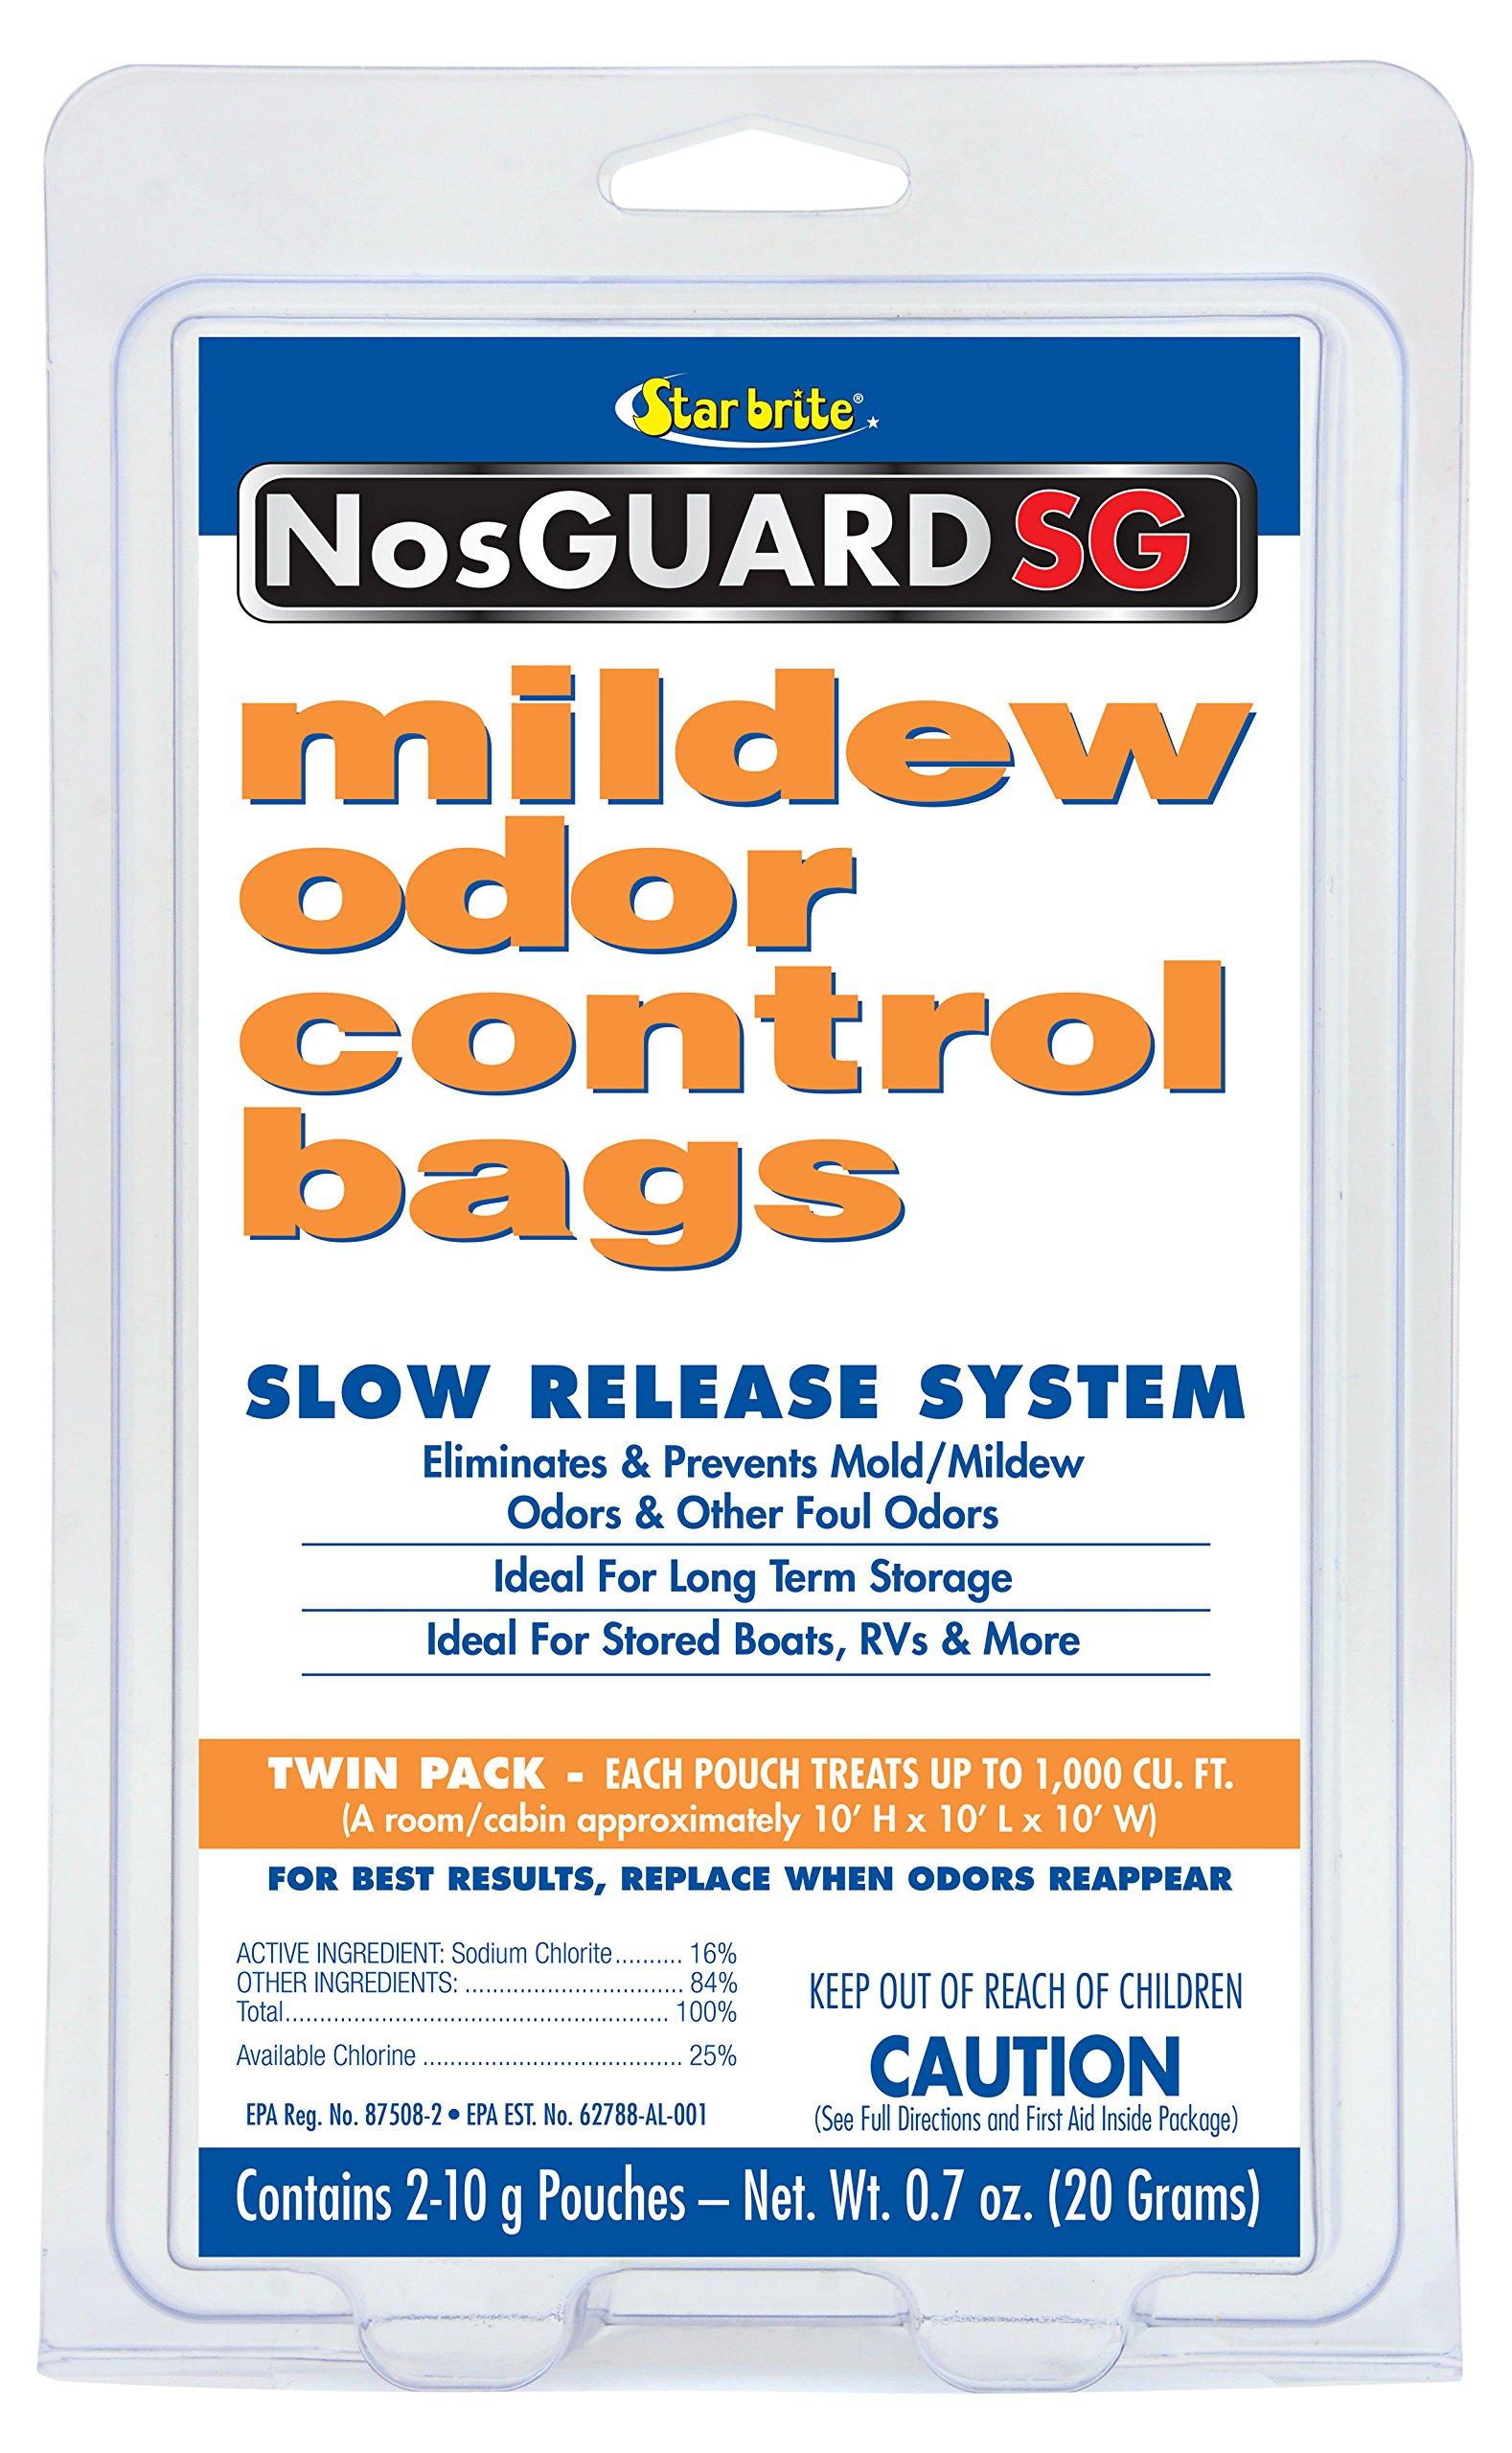 Star brite Mildew Odor Control - Slow Release System (25/pack) by Star Brite